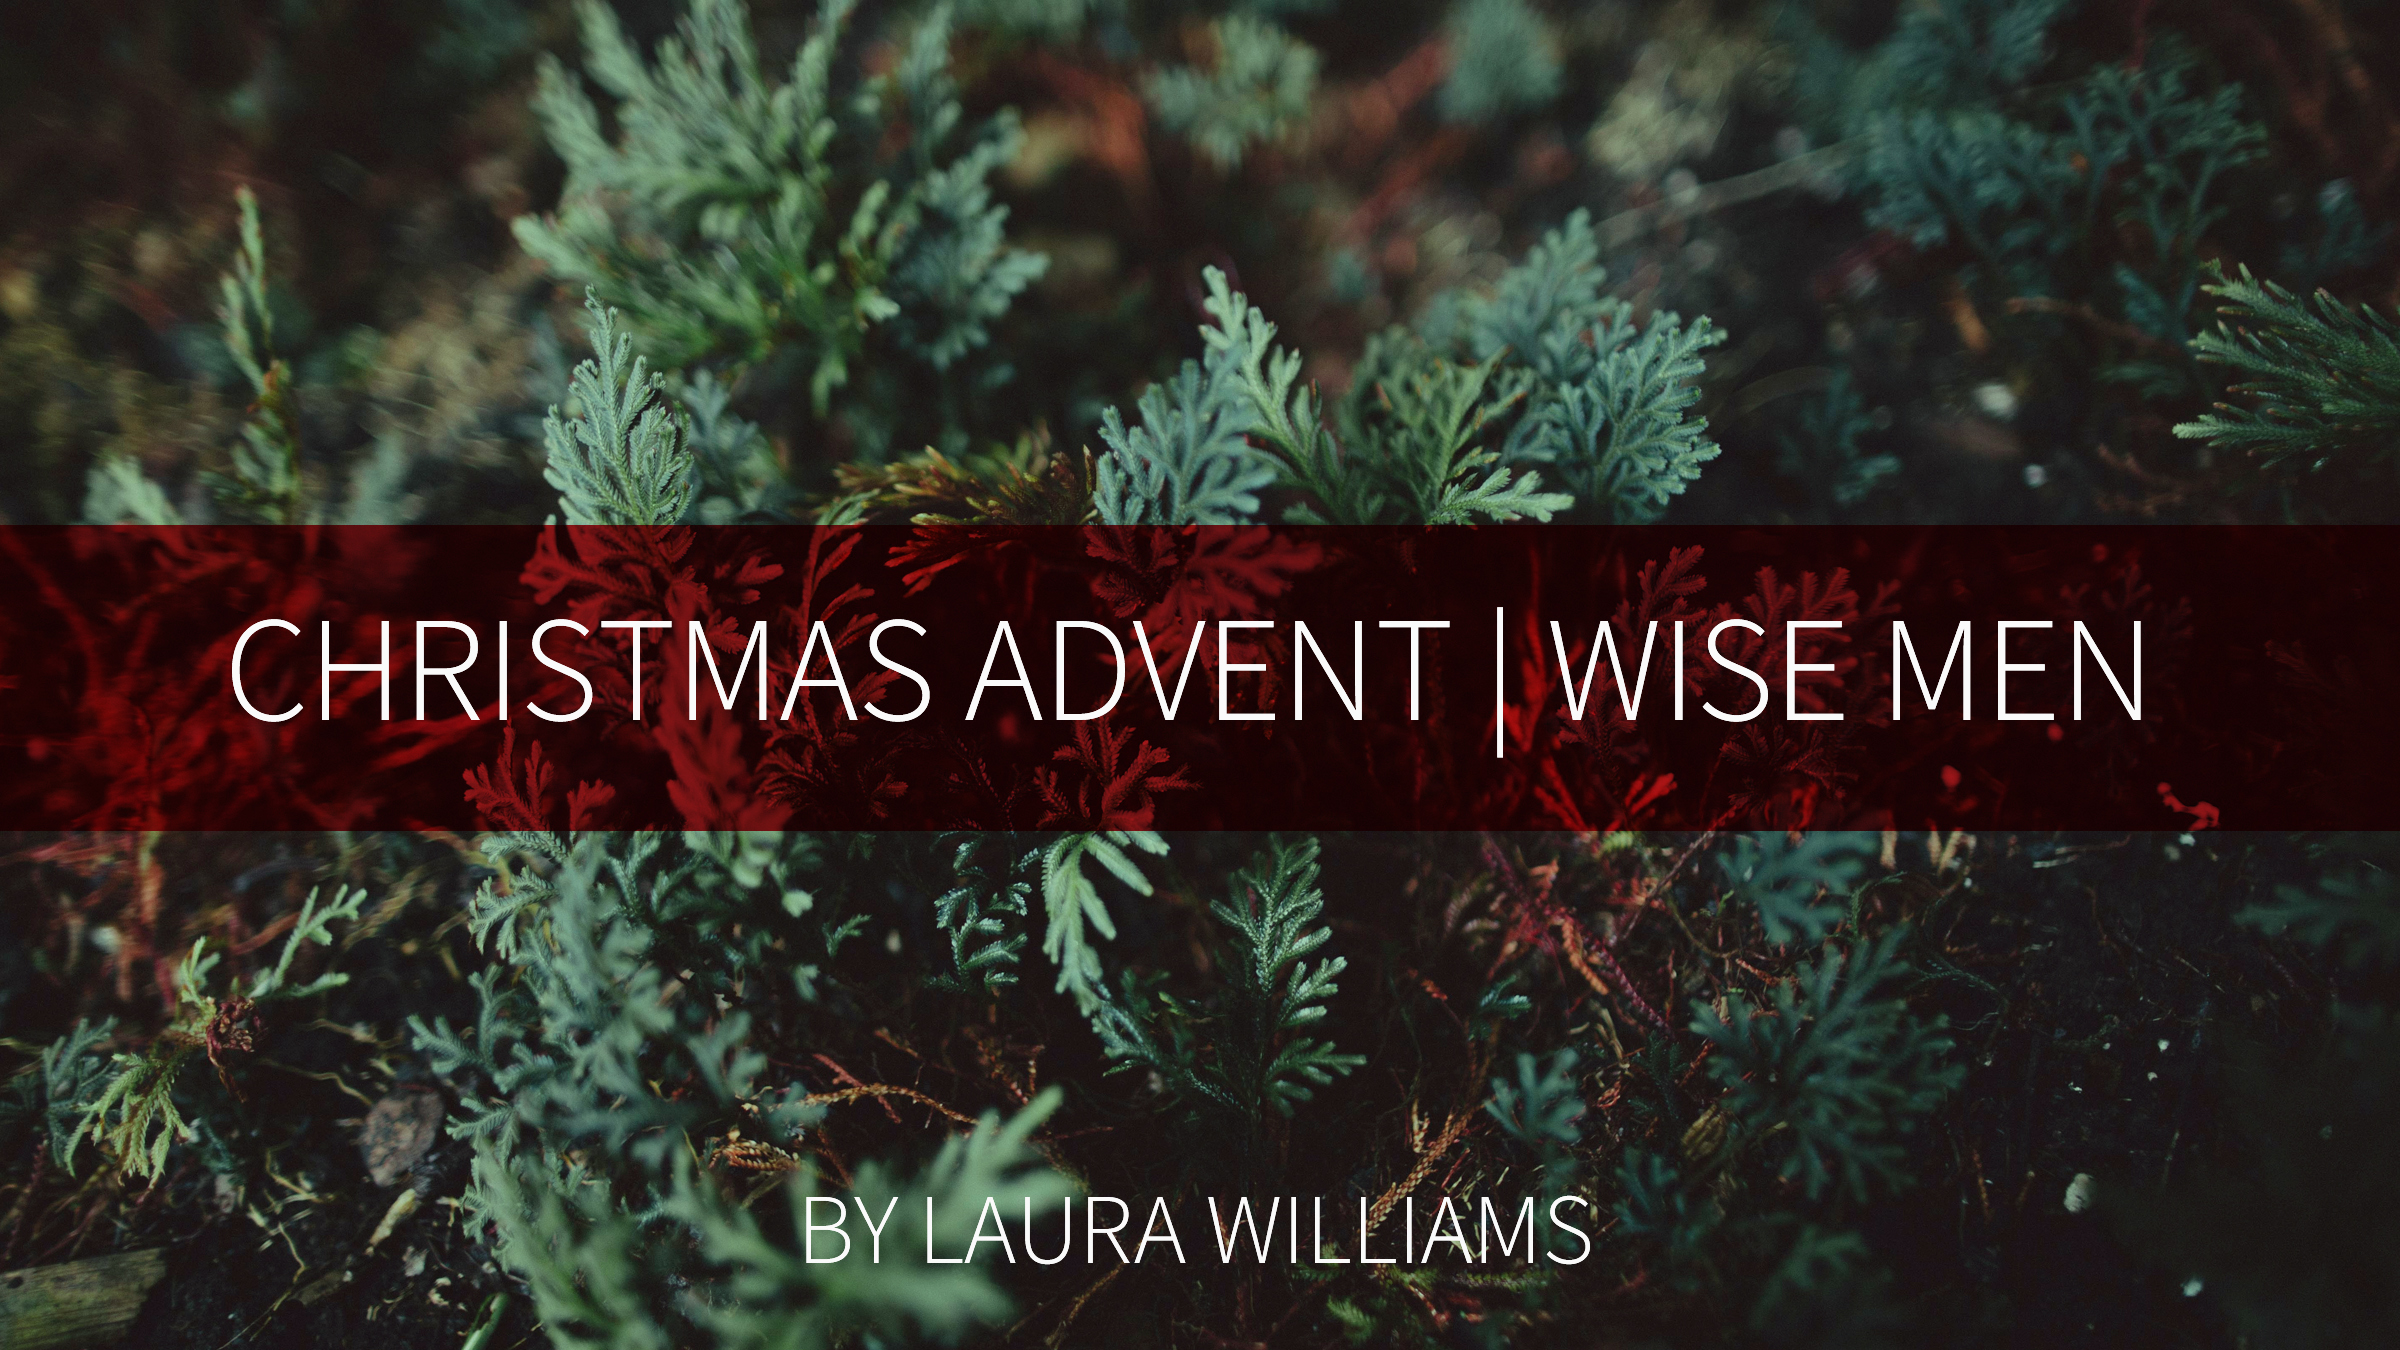 Christmas Advent - wise men.jpg